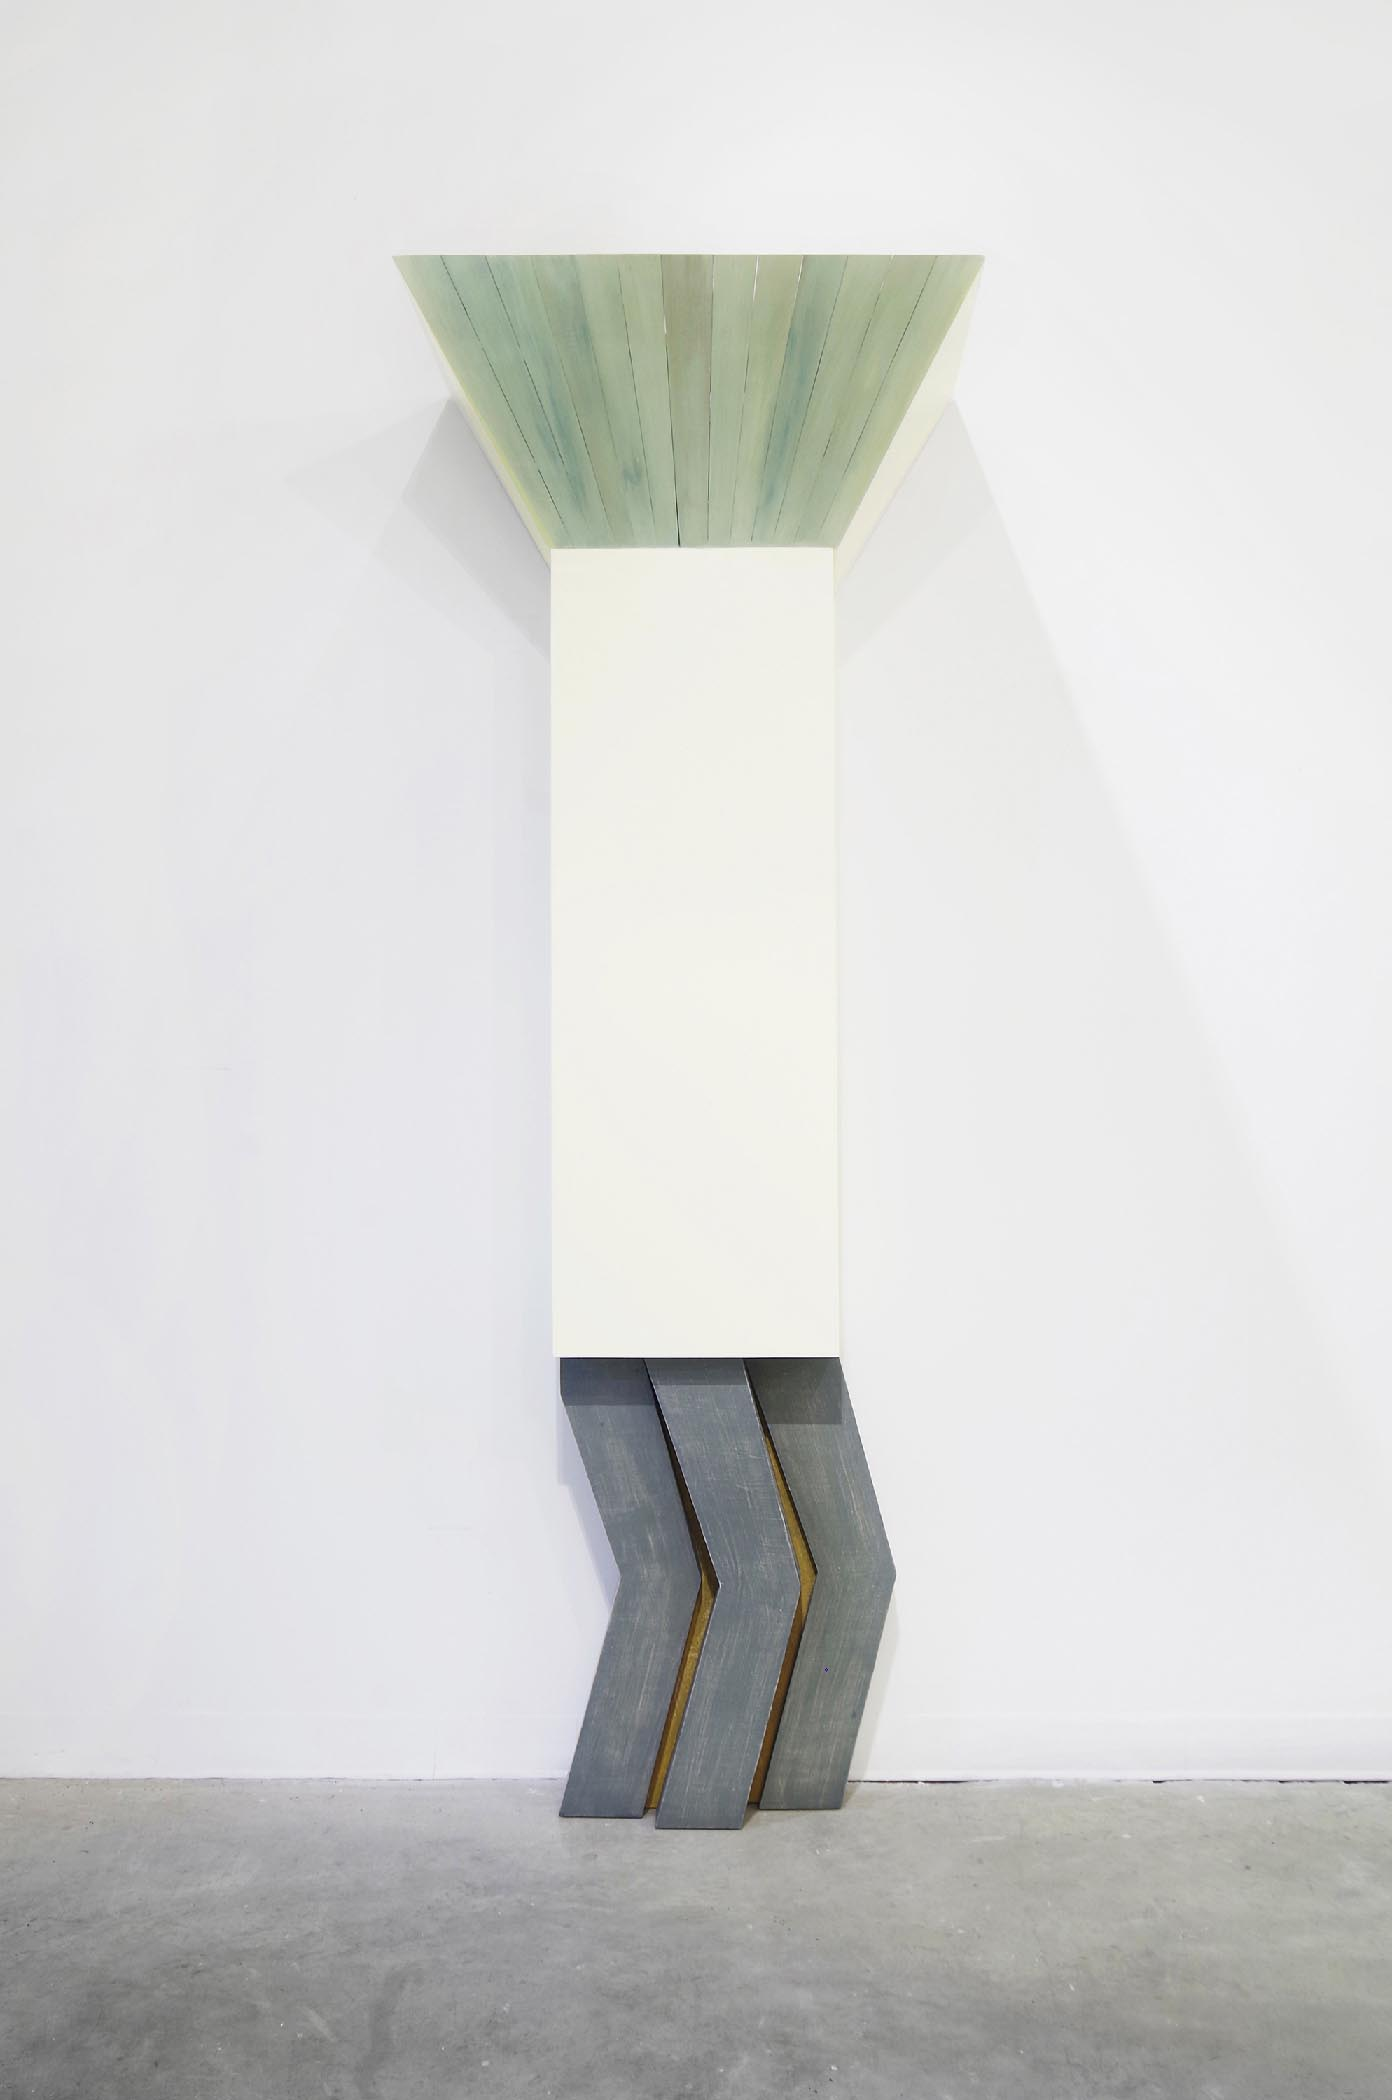 Sarah Tortora, plywood, epoxy clay, resin, minerals, paper pulp.